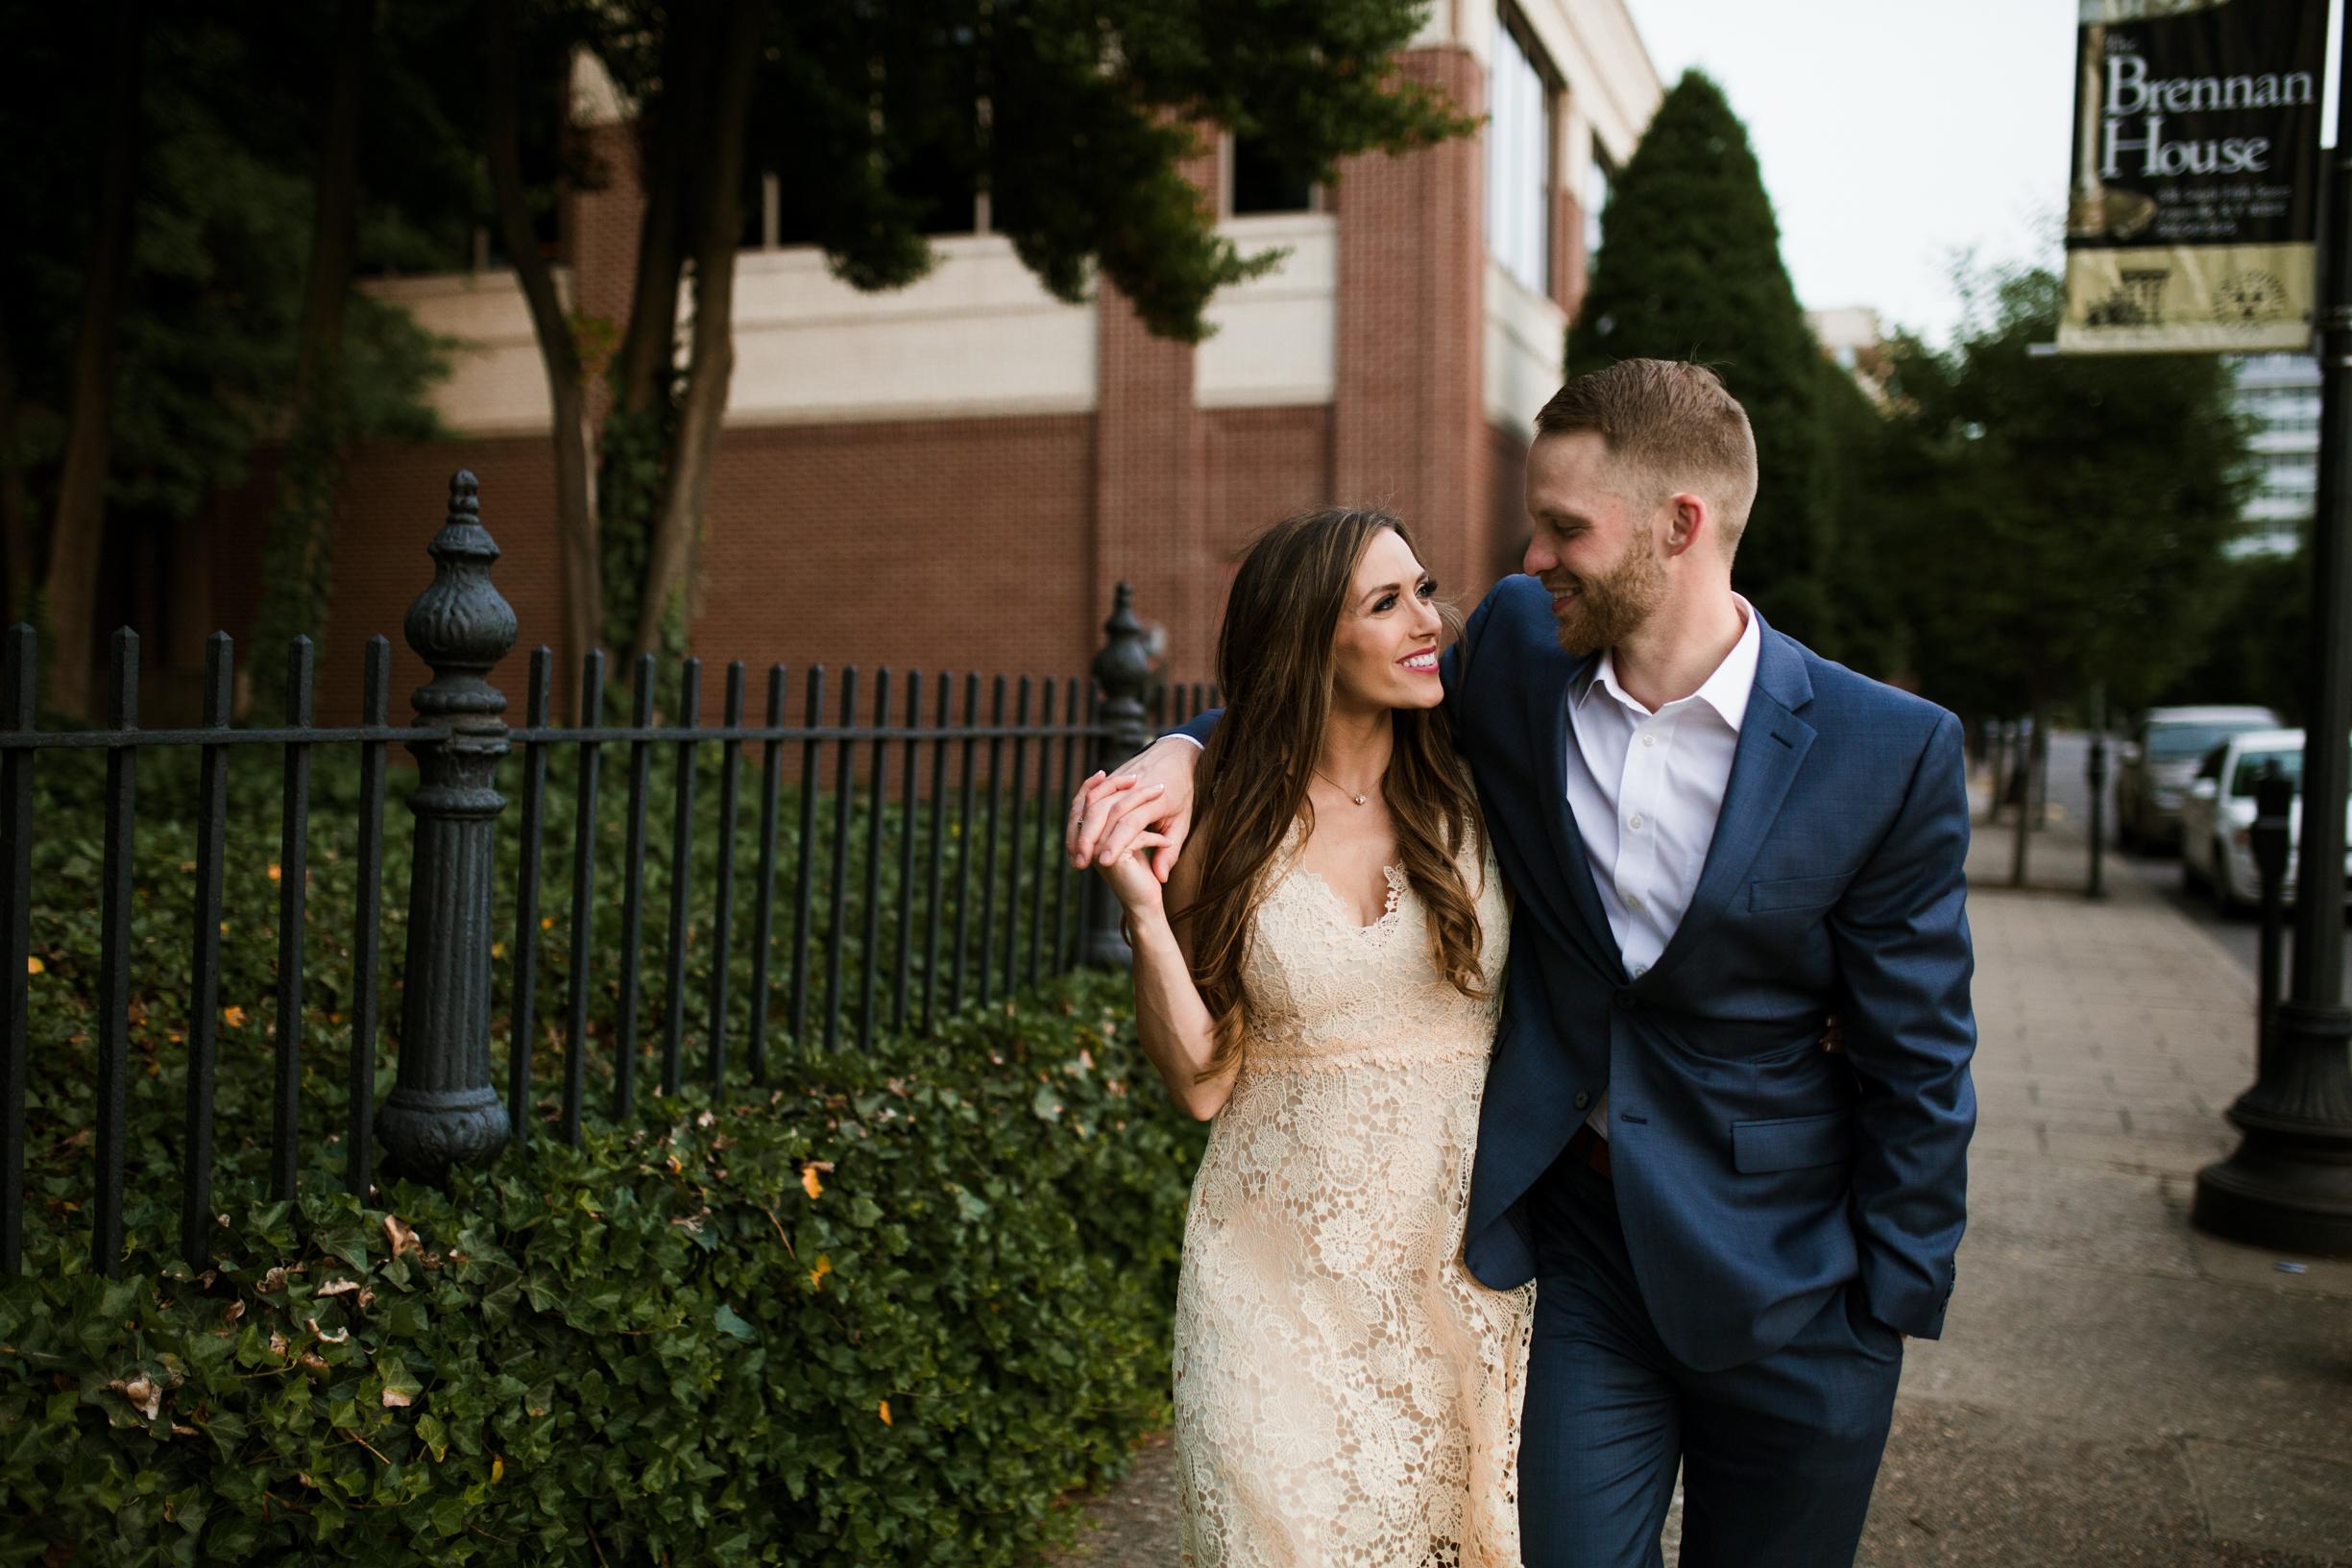 Victoria & Chad Engagement 2018 Crystal Ludwick Photo Louisville Kentucky Wedding Photographer WEBSITE (36 of 48).jpg